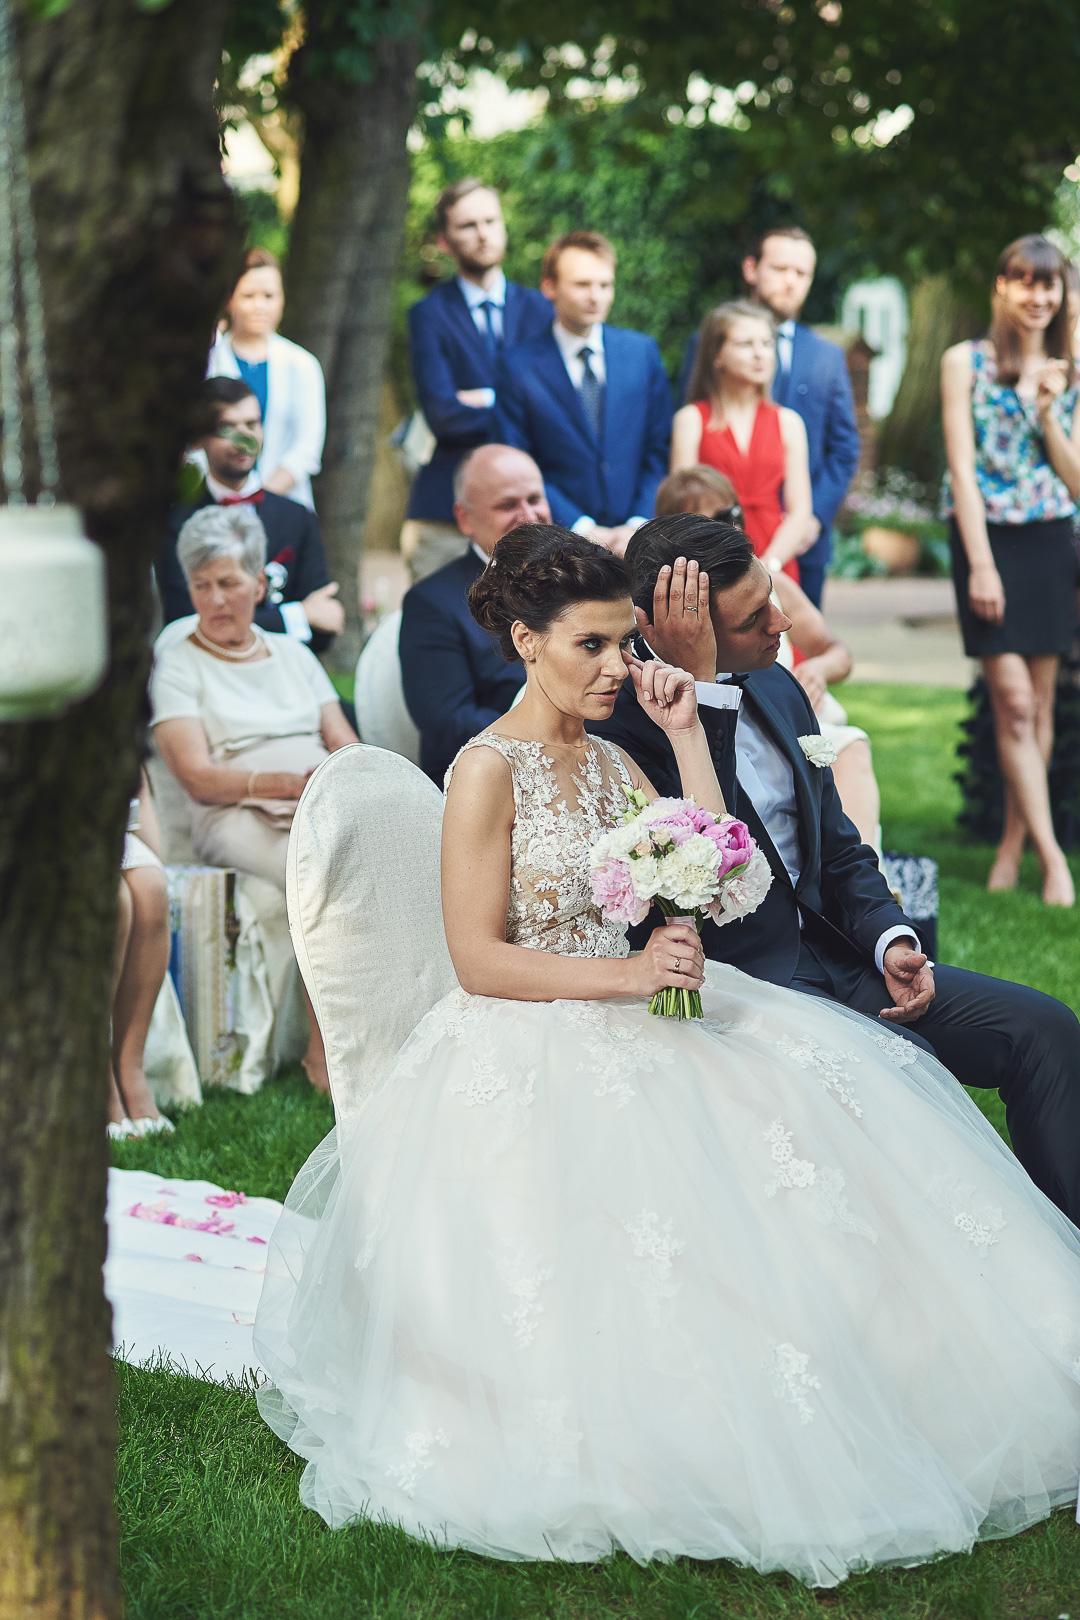 Fotoreportaż ze ślubu Ani i Patryka / Villa Julianna 65